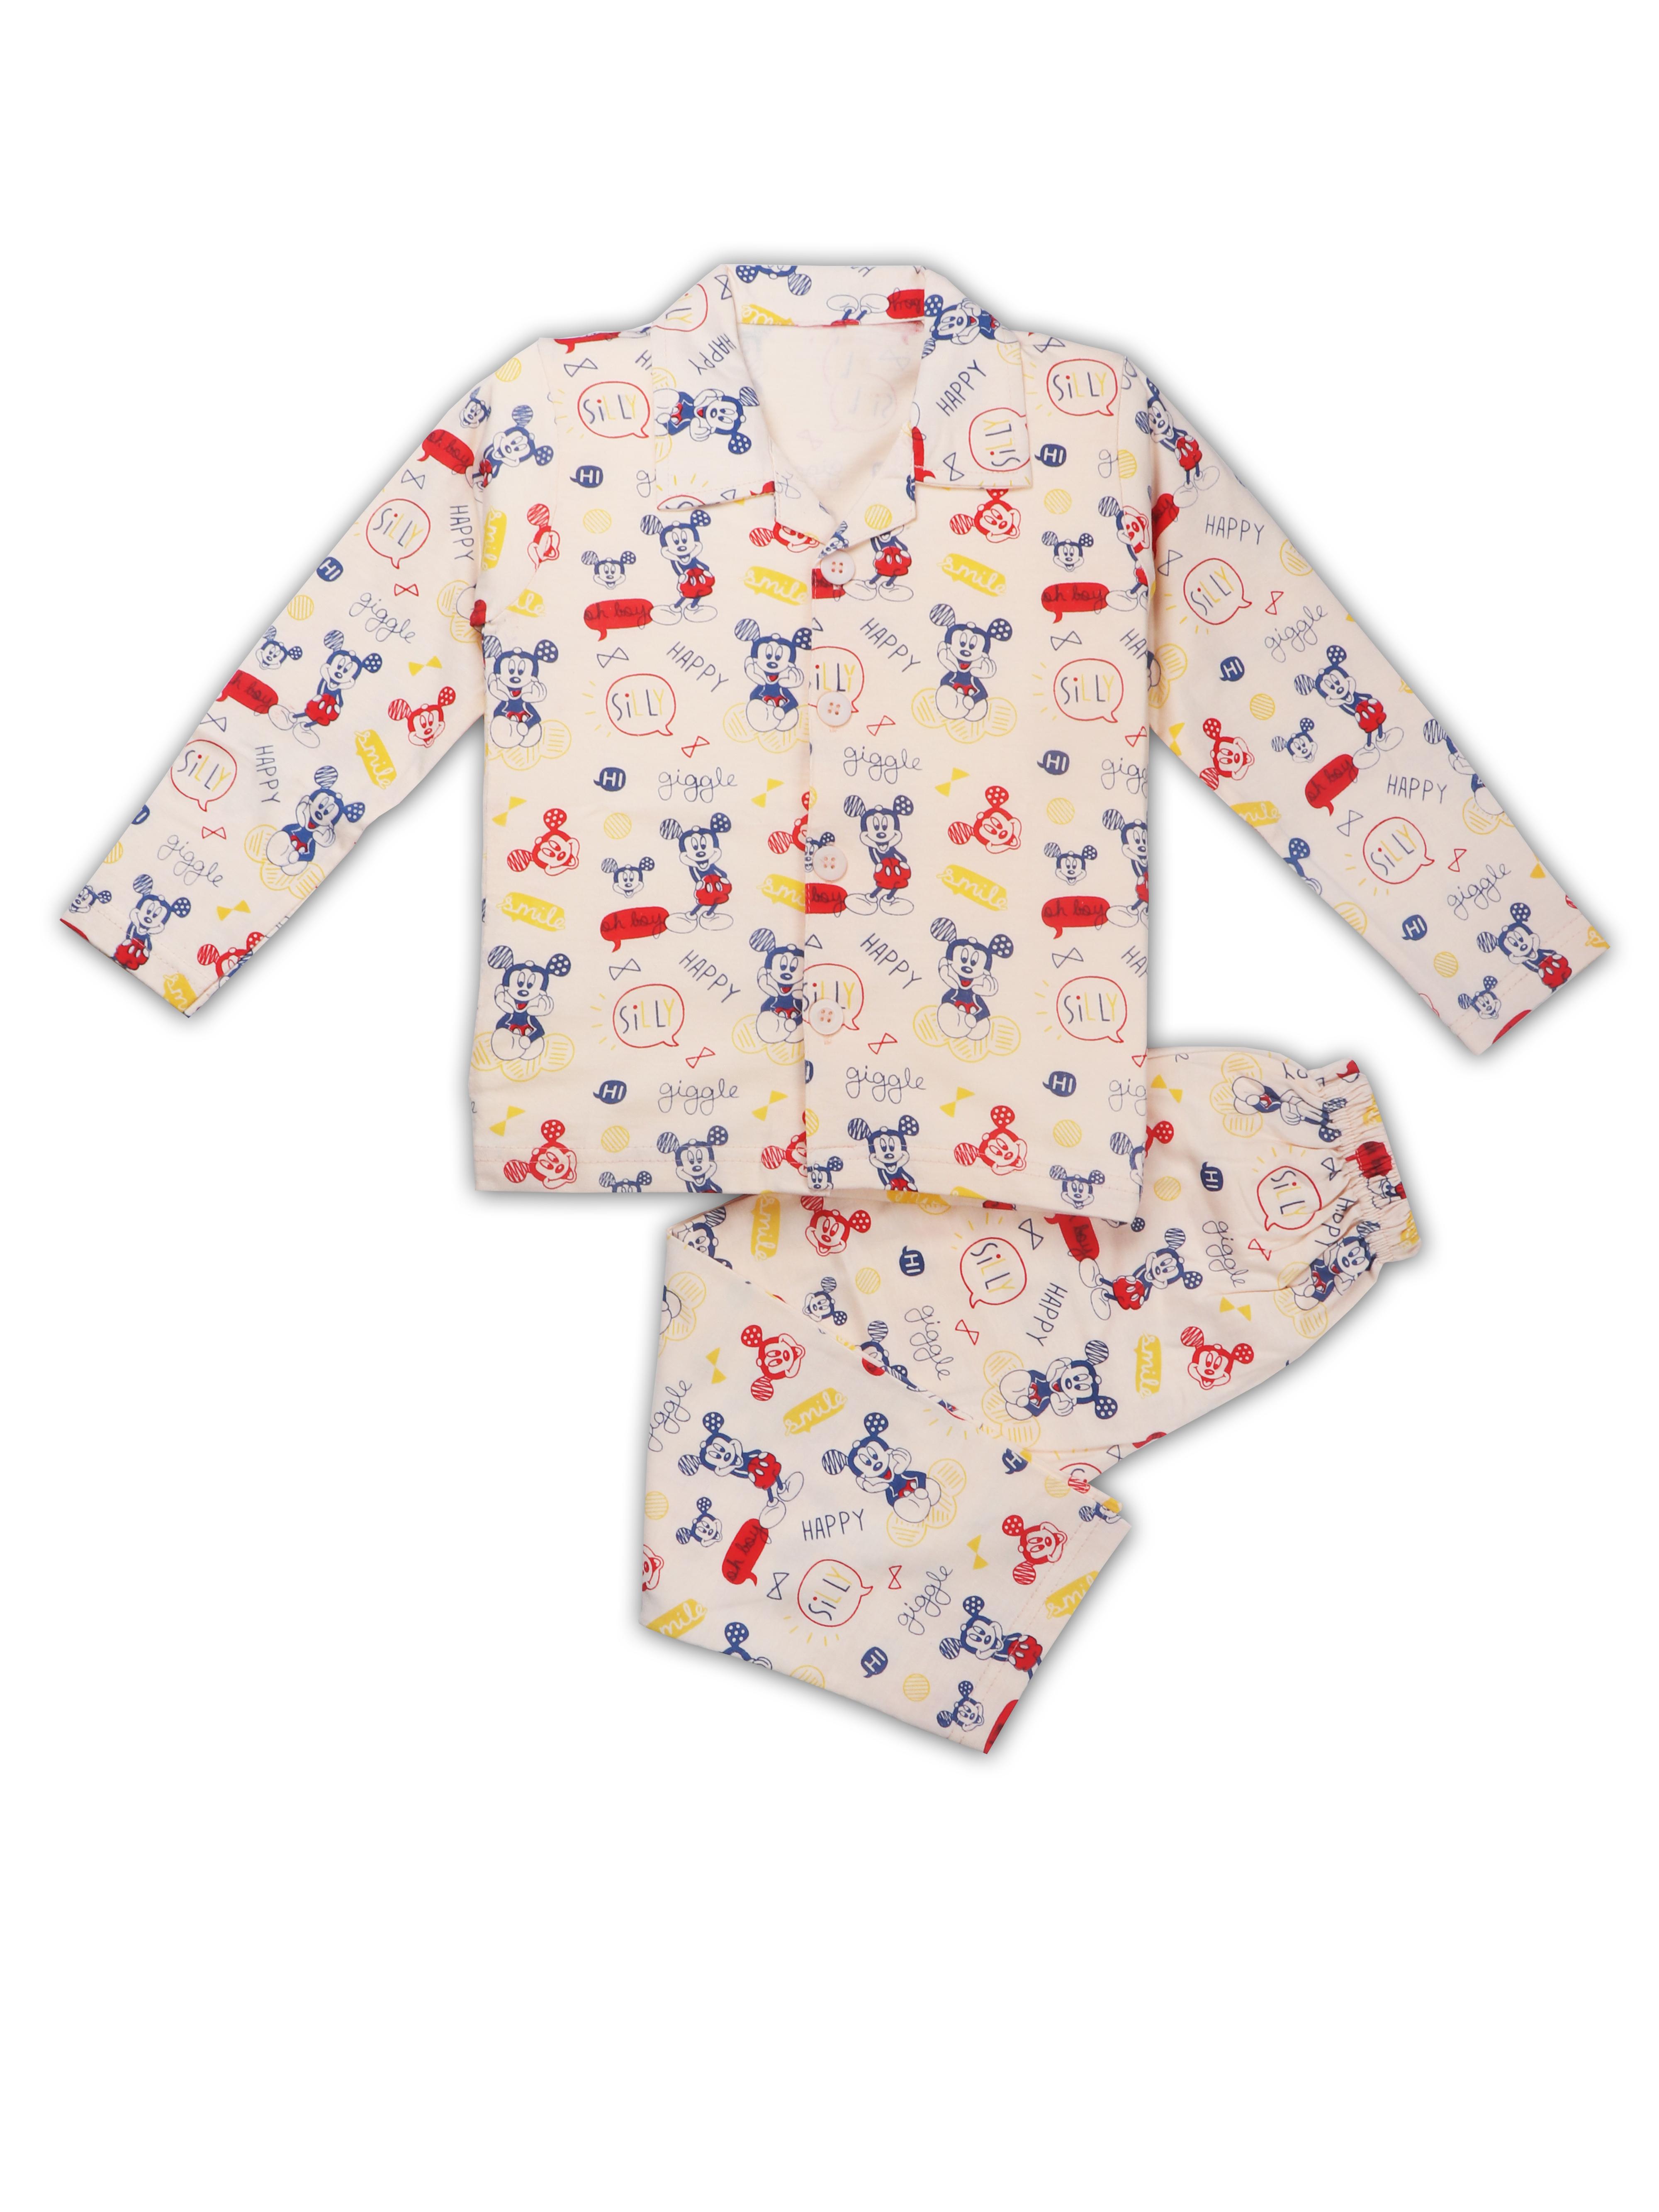 AAAKAR | AAAKAR Full Sleeves Night Suit All Over Print Mickey - Peach